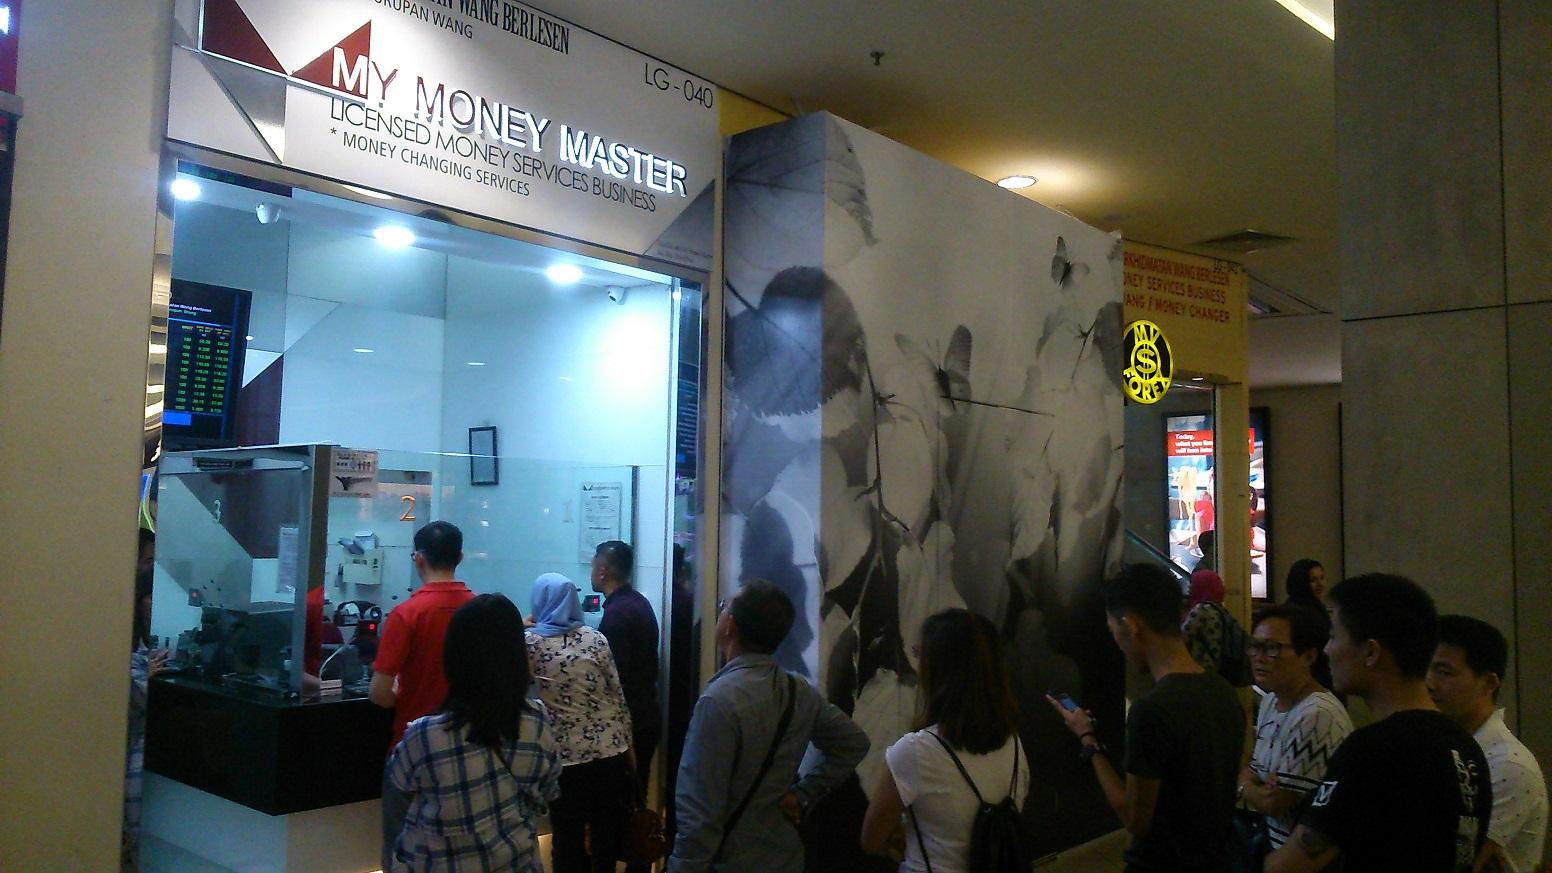 Moneymaster